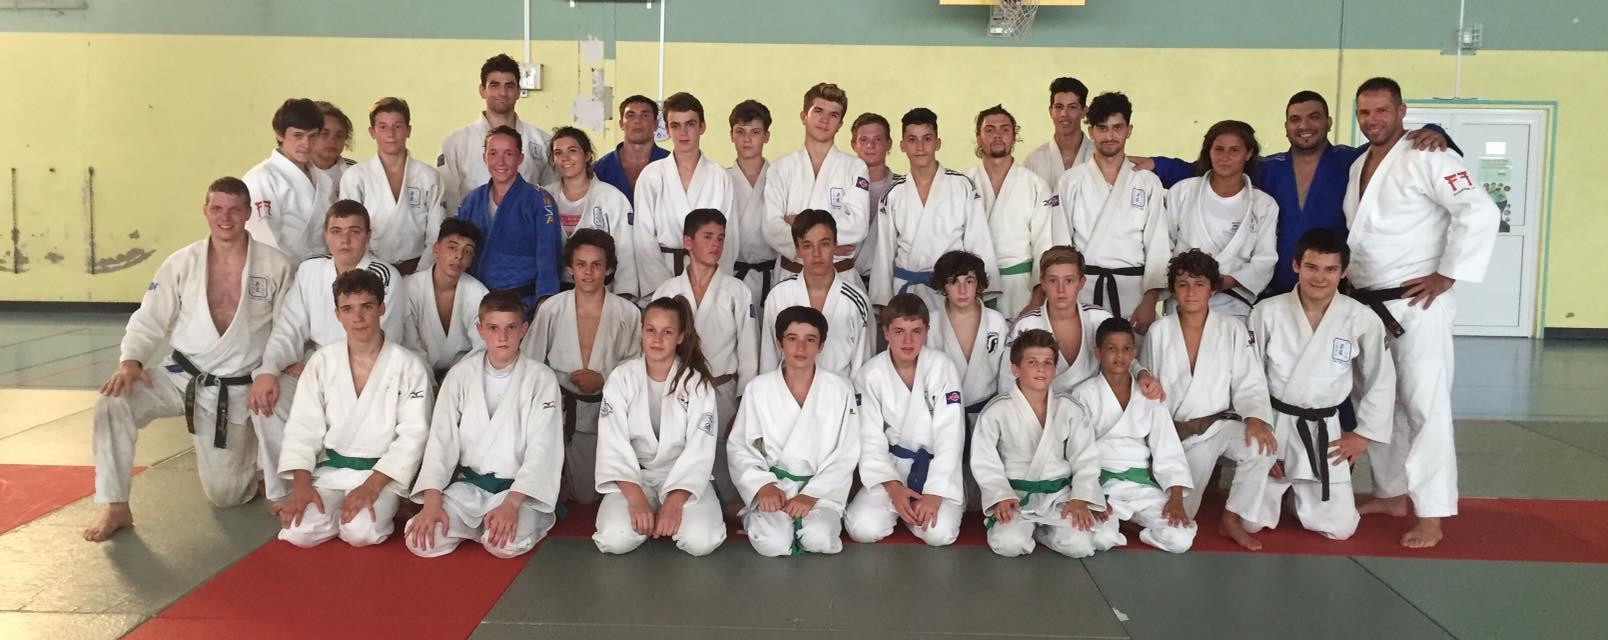 shimizu club judo Sorgues Vaucluse